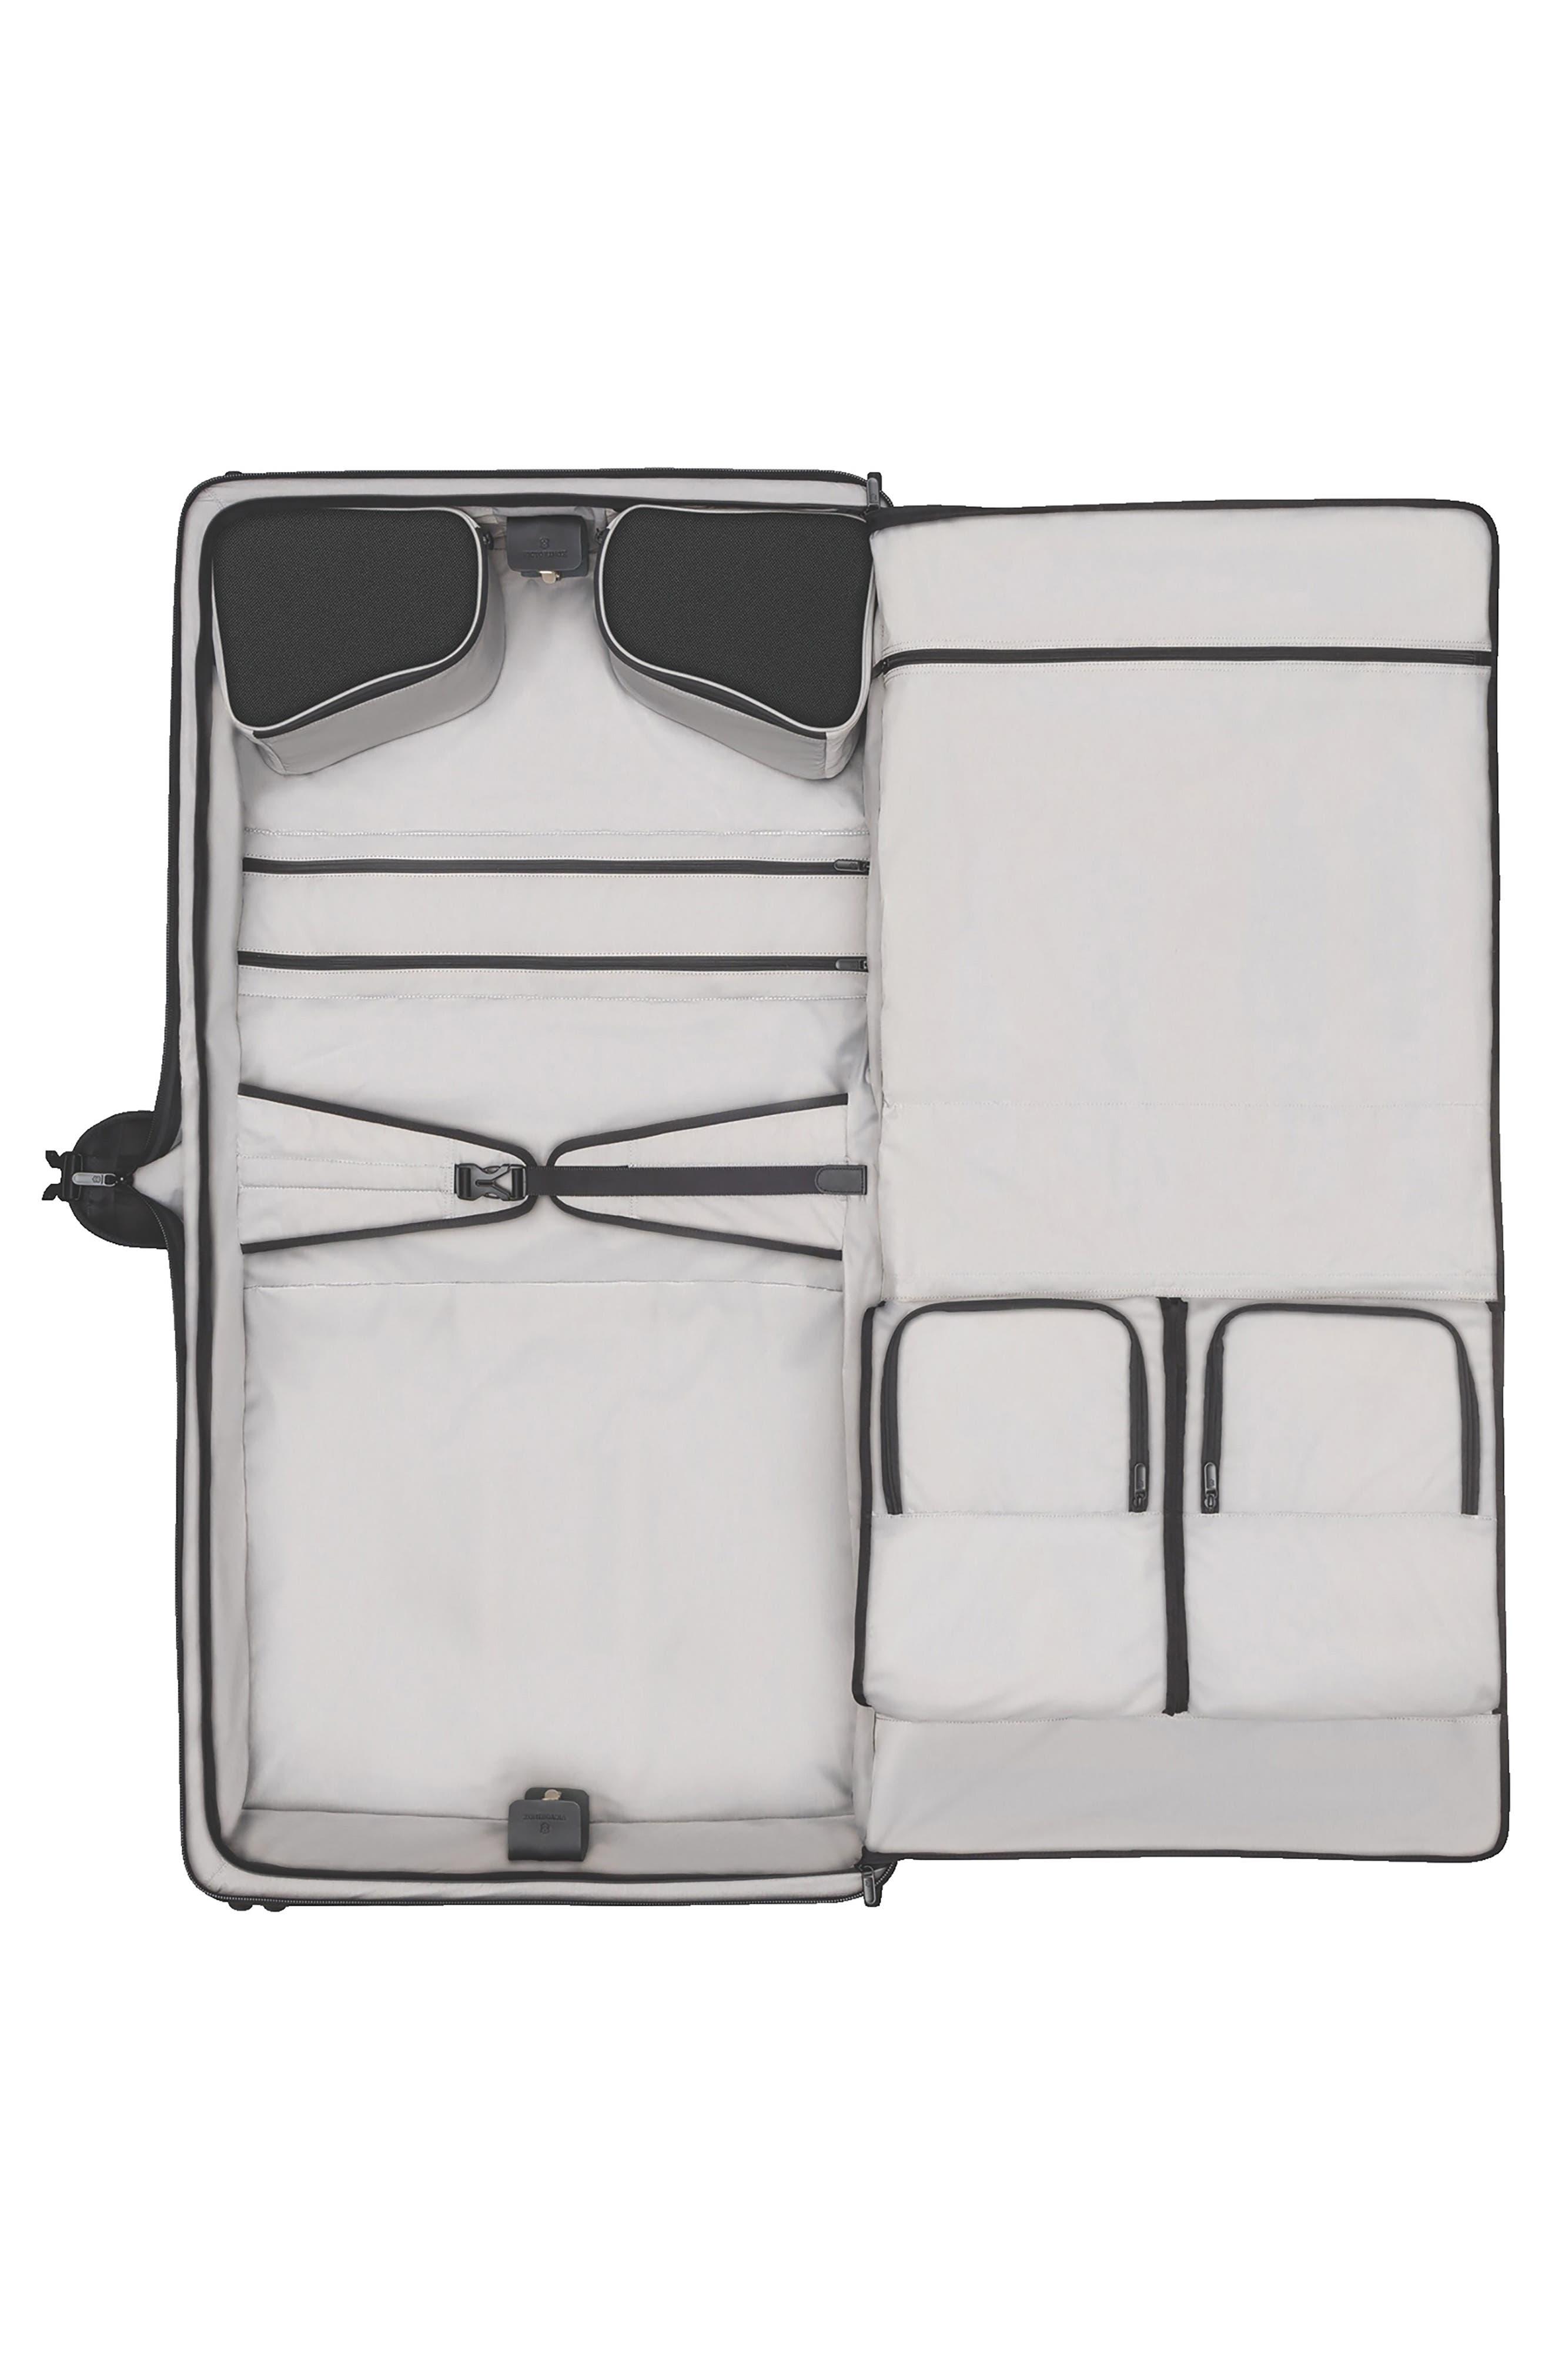 Lexicon 2.0 Wheeled Garment Bag,                             Alternate thumbnail 2, color,                             001